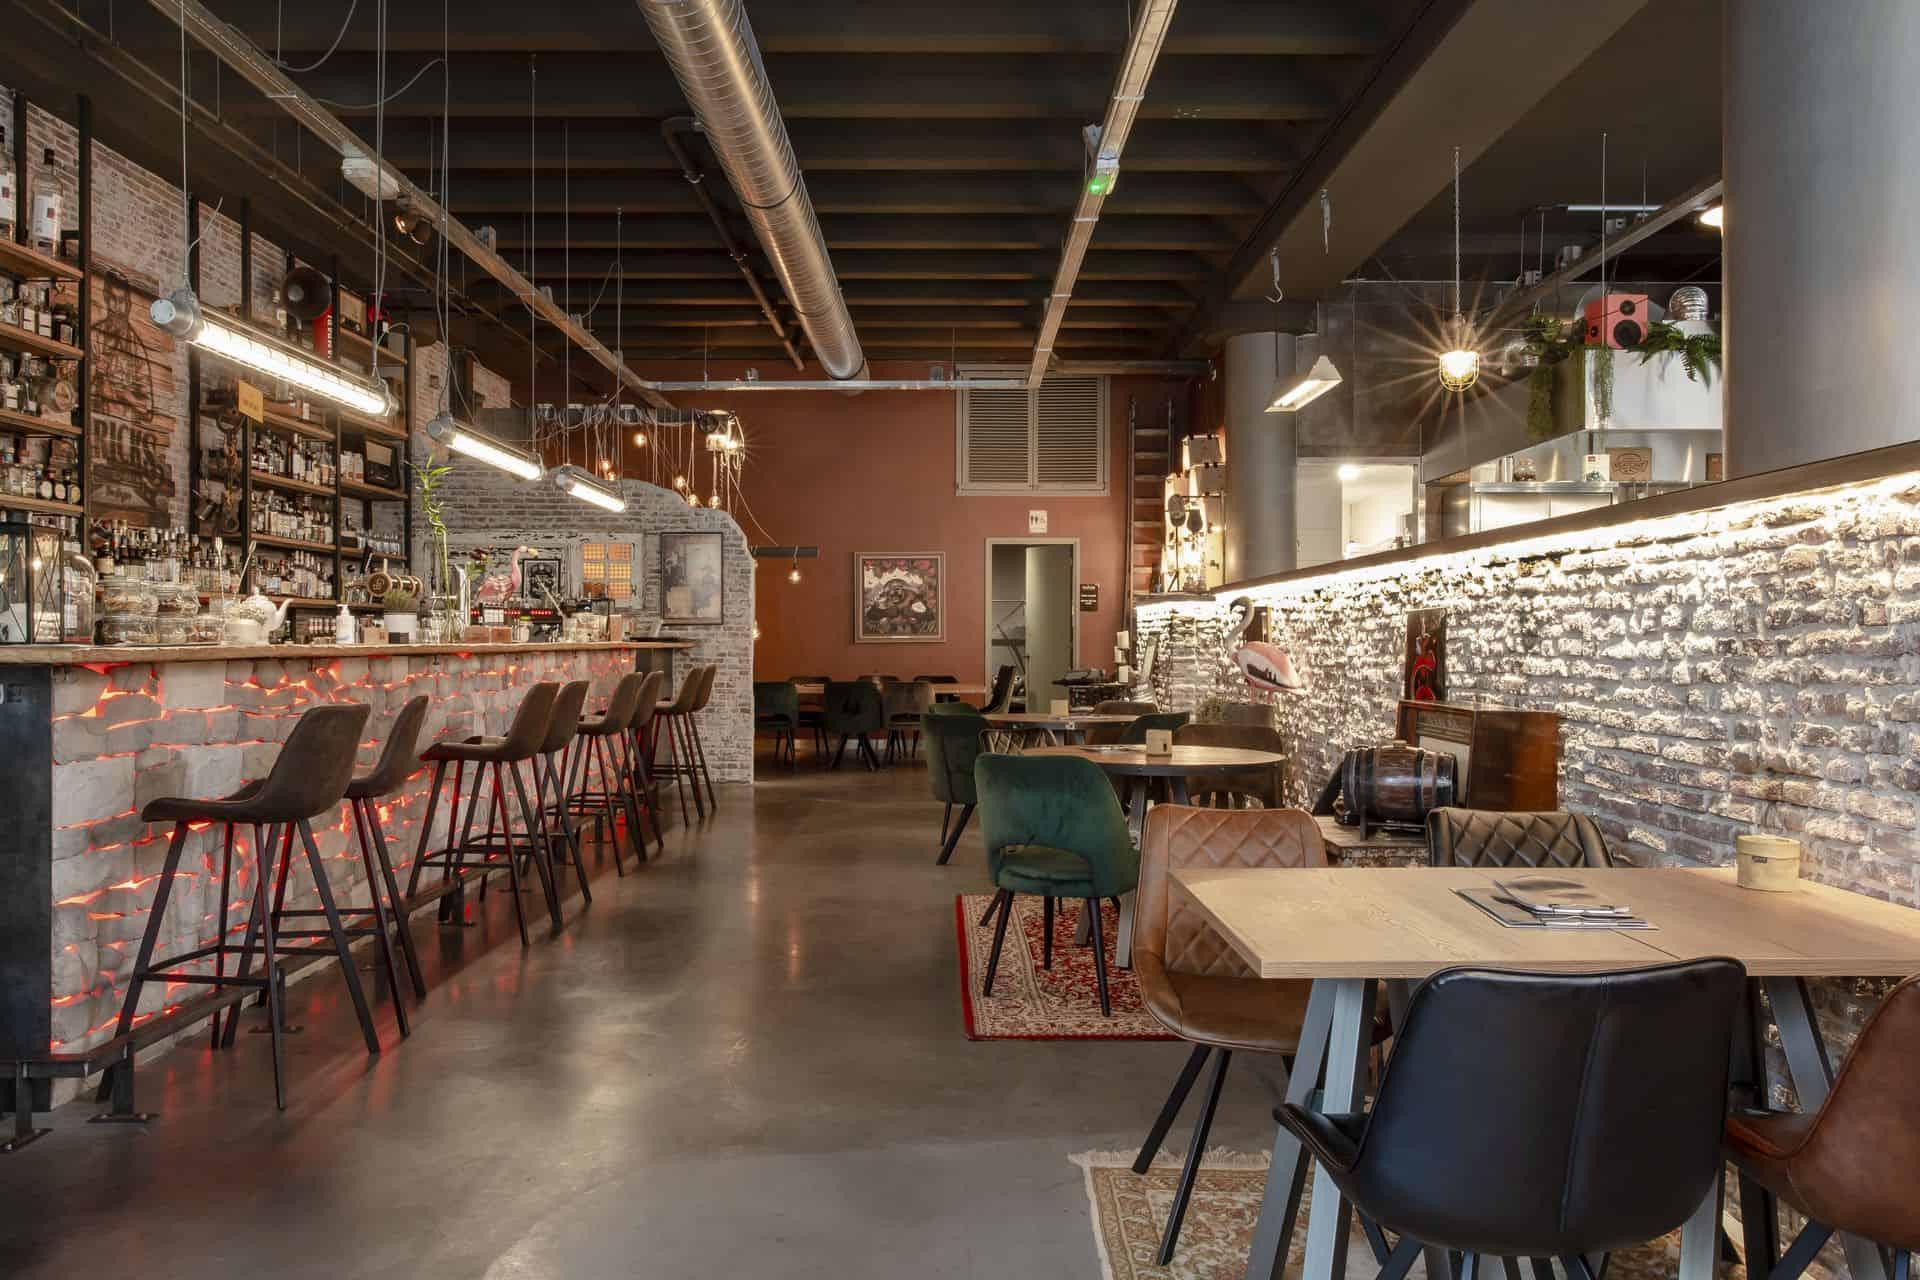 vloer restaurant, restaurantvloer, constructievloer